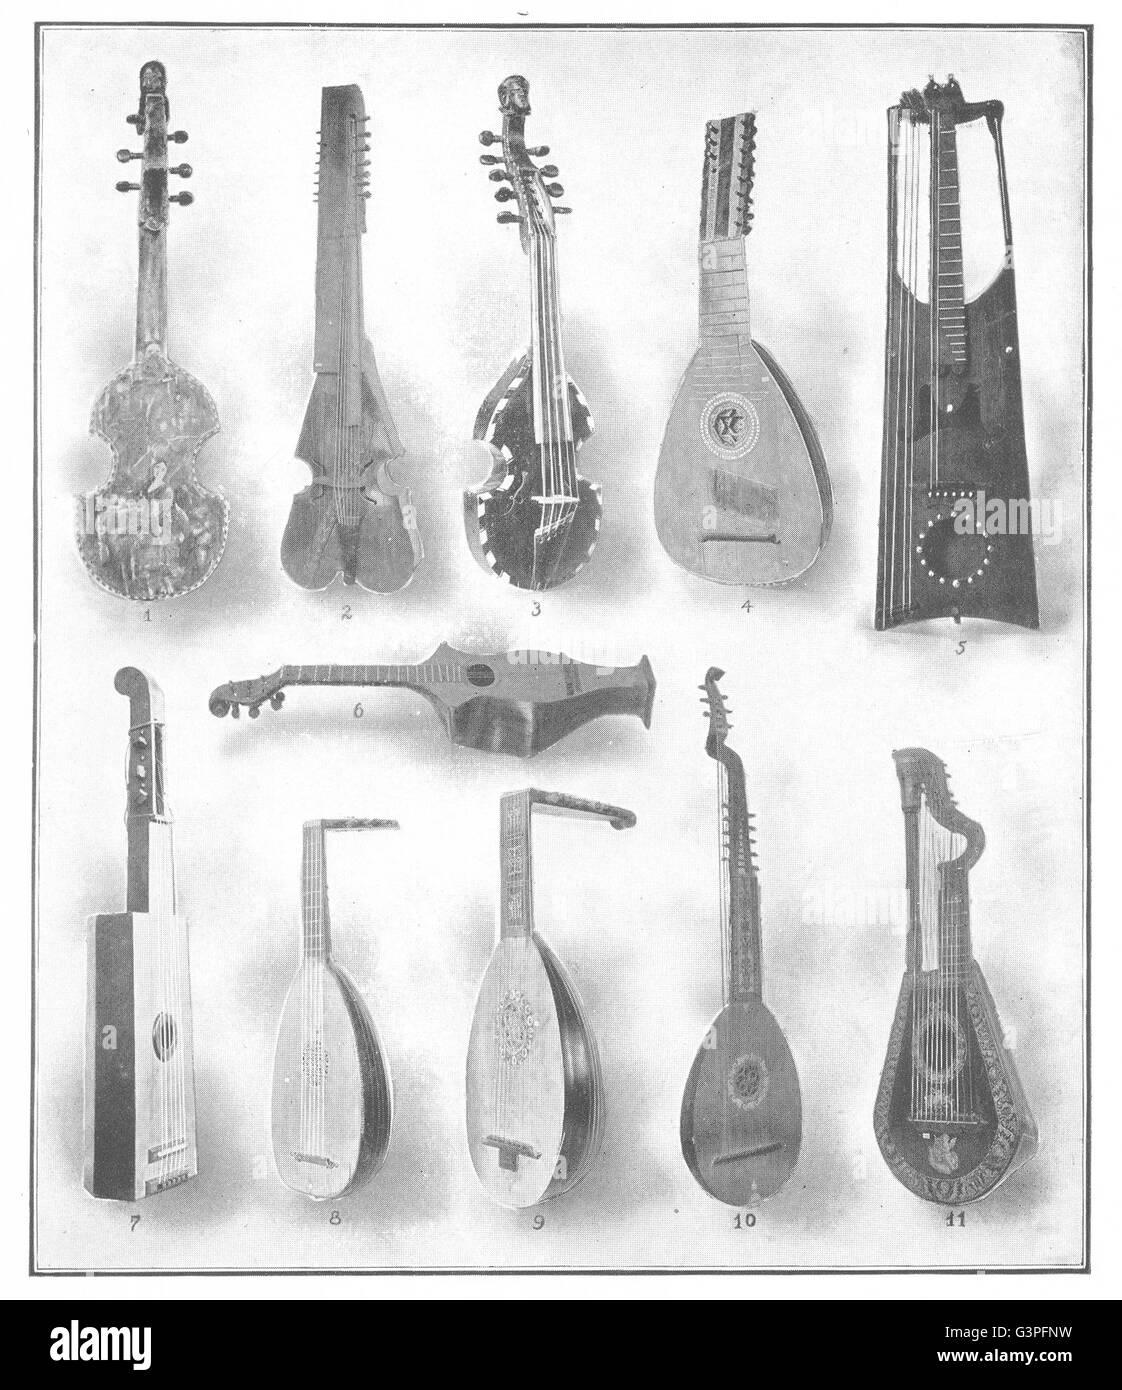 FRANCE: Alto viol Baryton Pochette Amour Mandora guitar Harp Lute Theorbo, 1907 - Stock Image